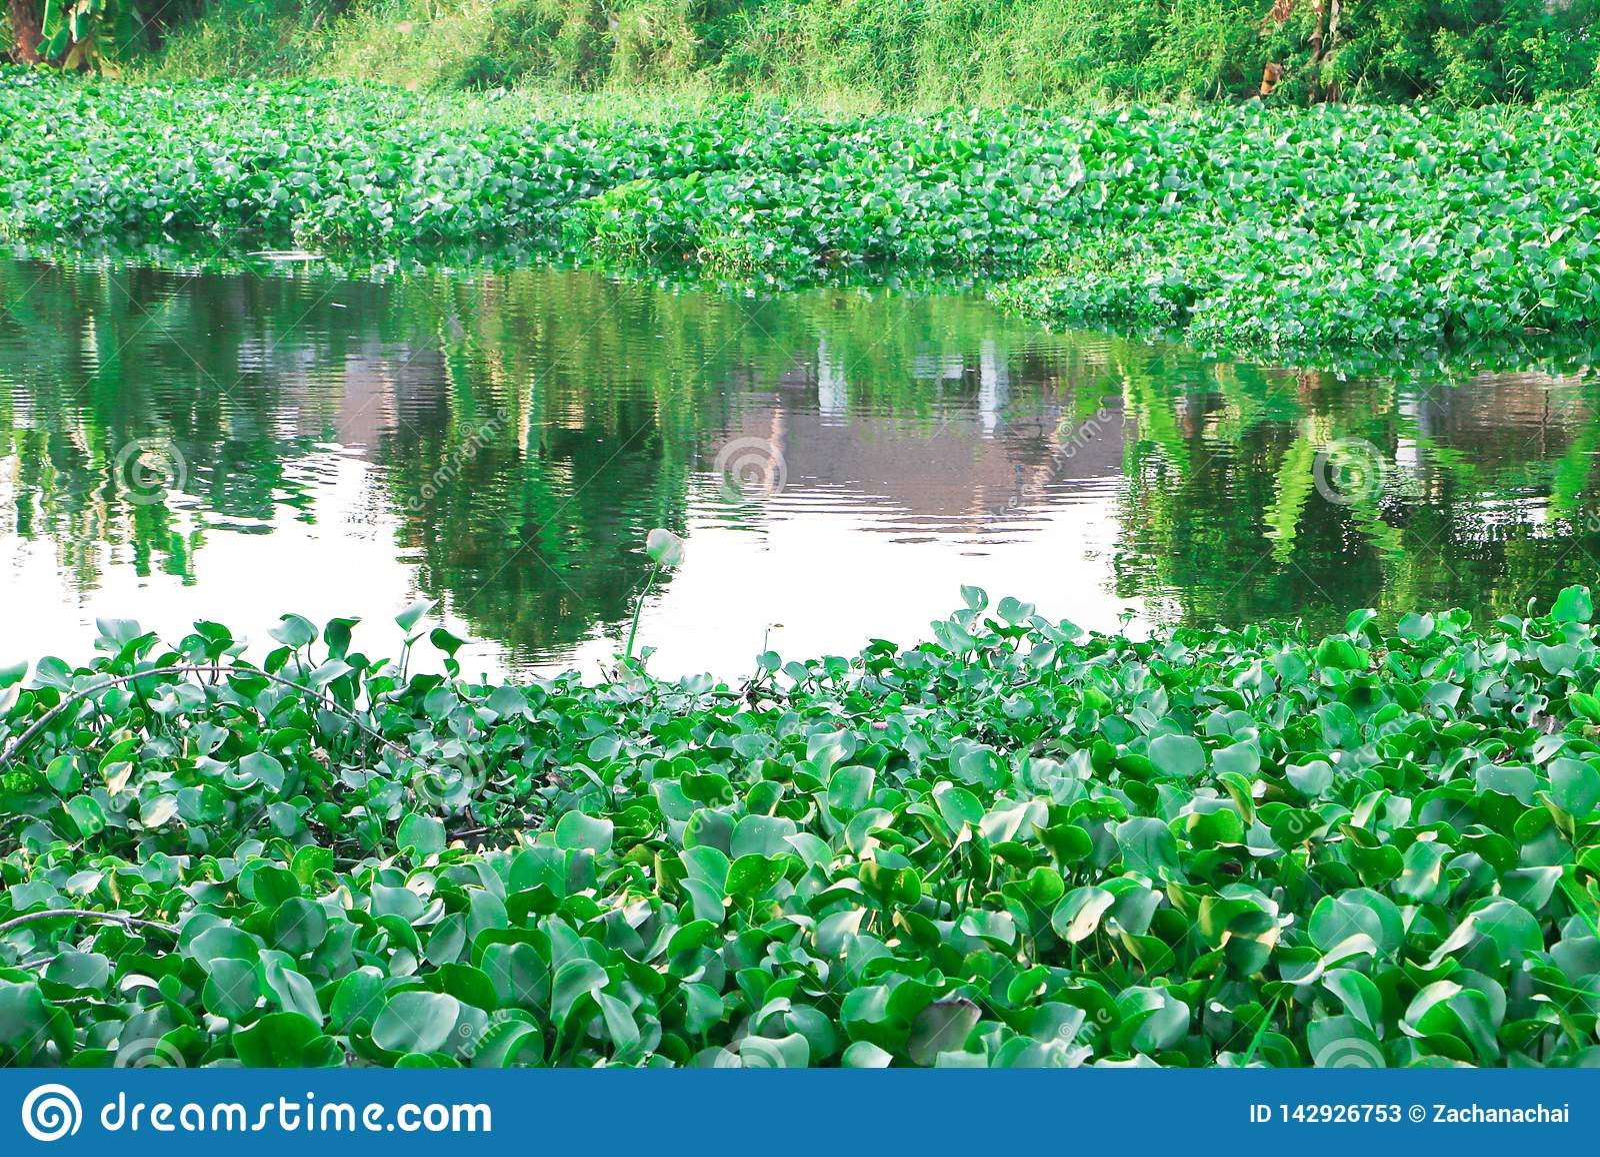 Thai water hyacinth